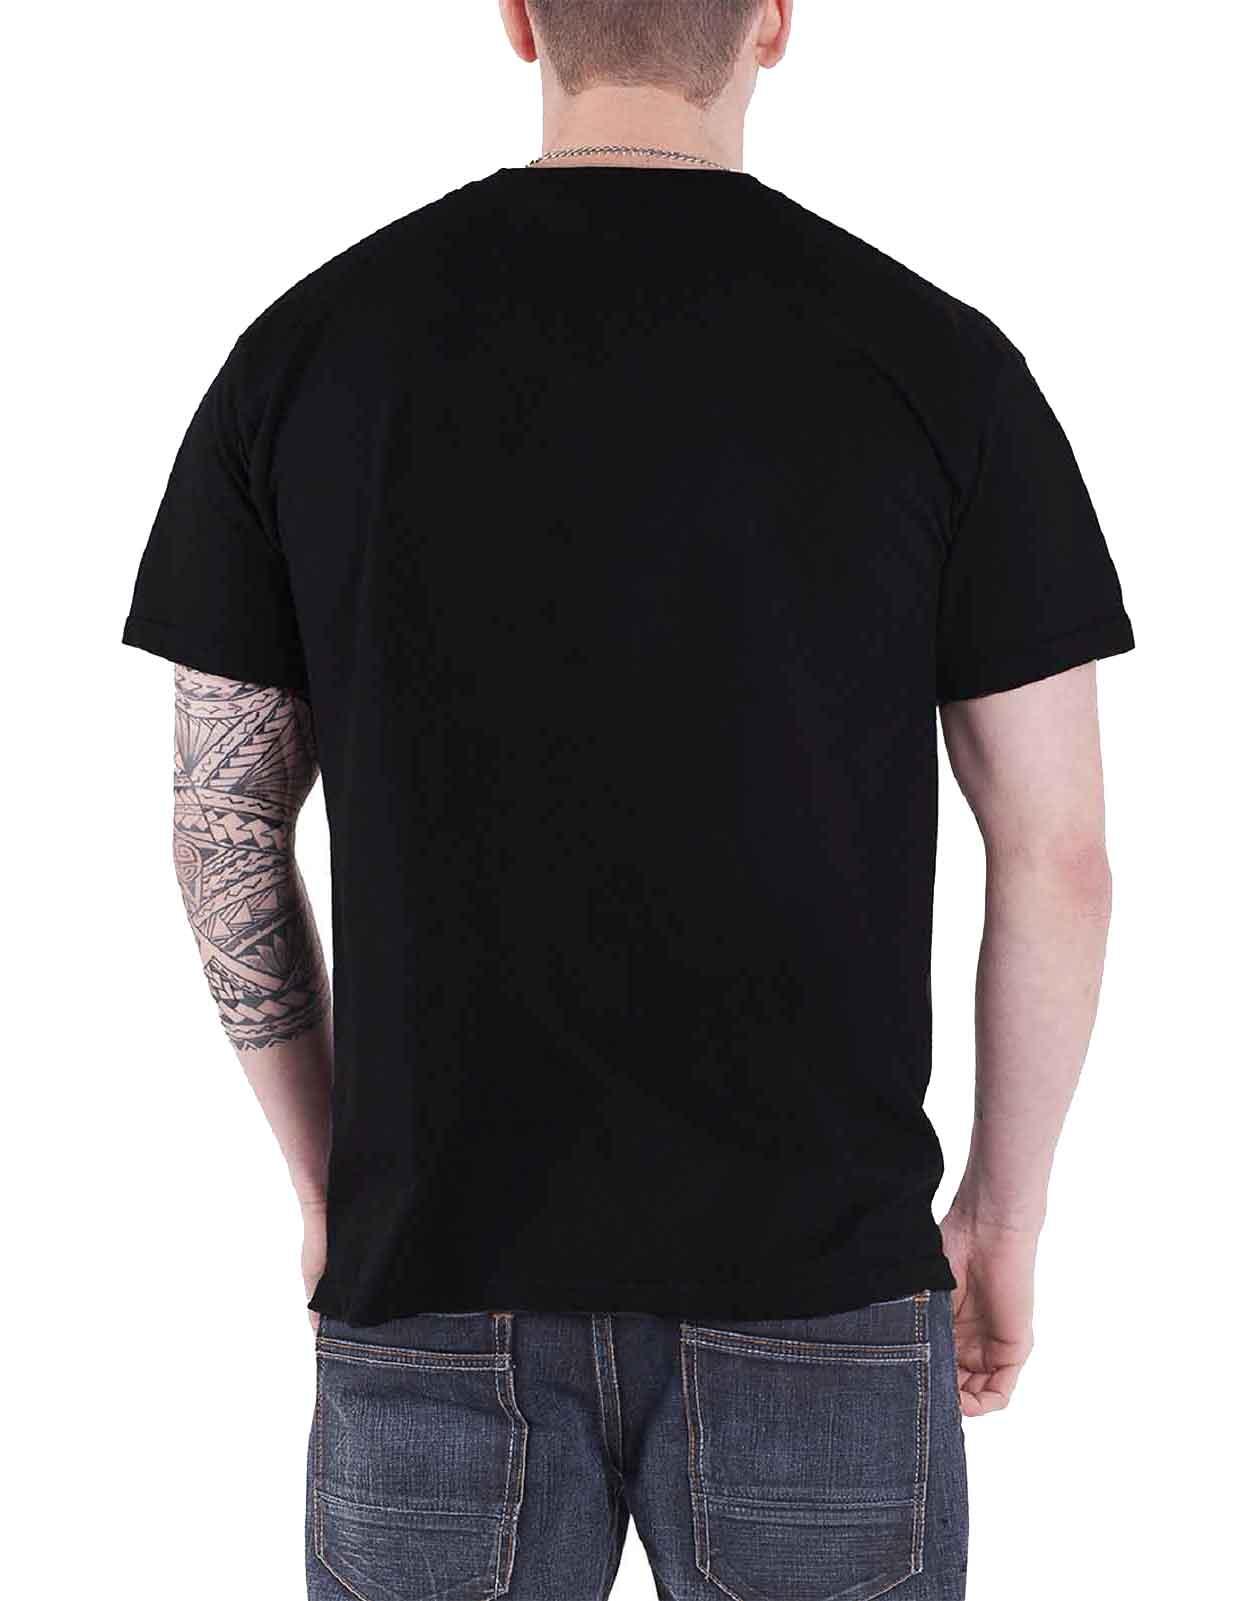 Misfits-T-Shirt-Official-fiend-Skull-Band-Logo-Die-Die-My-Darling-Mens-New thumbnail 17